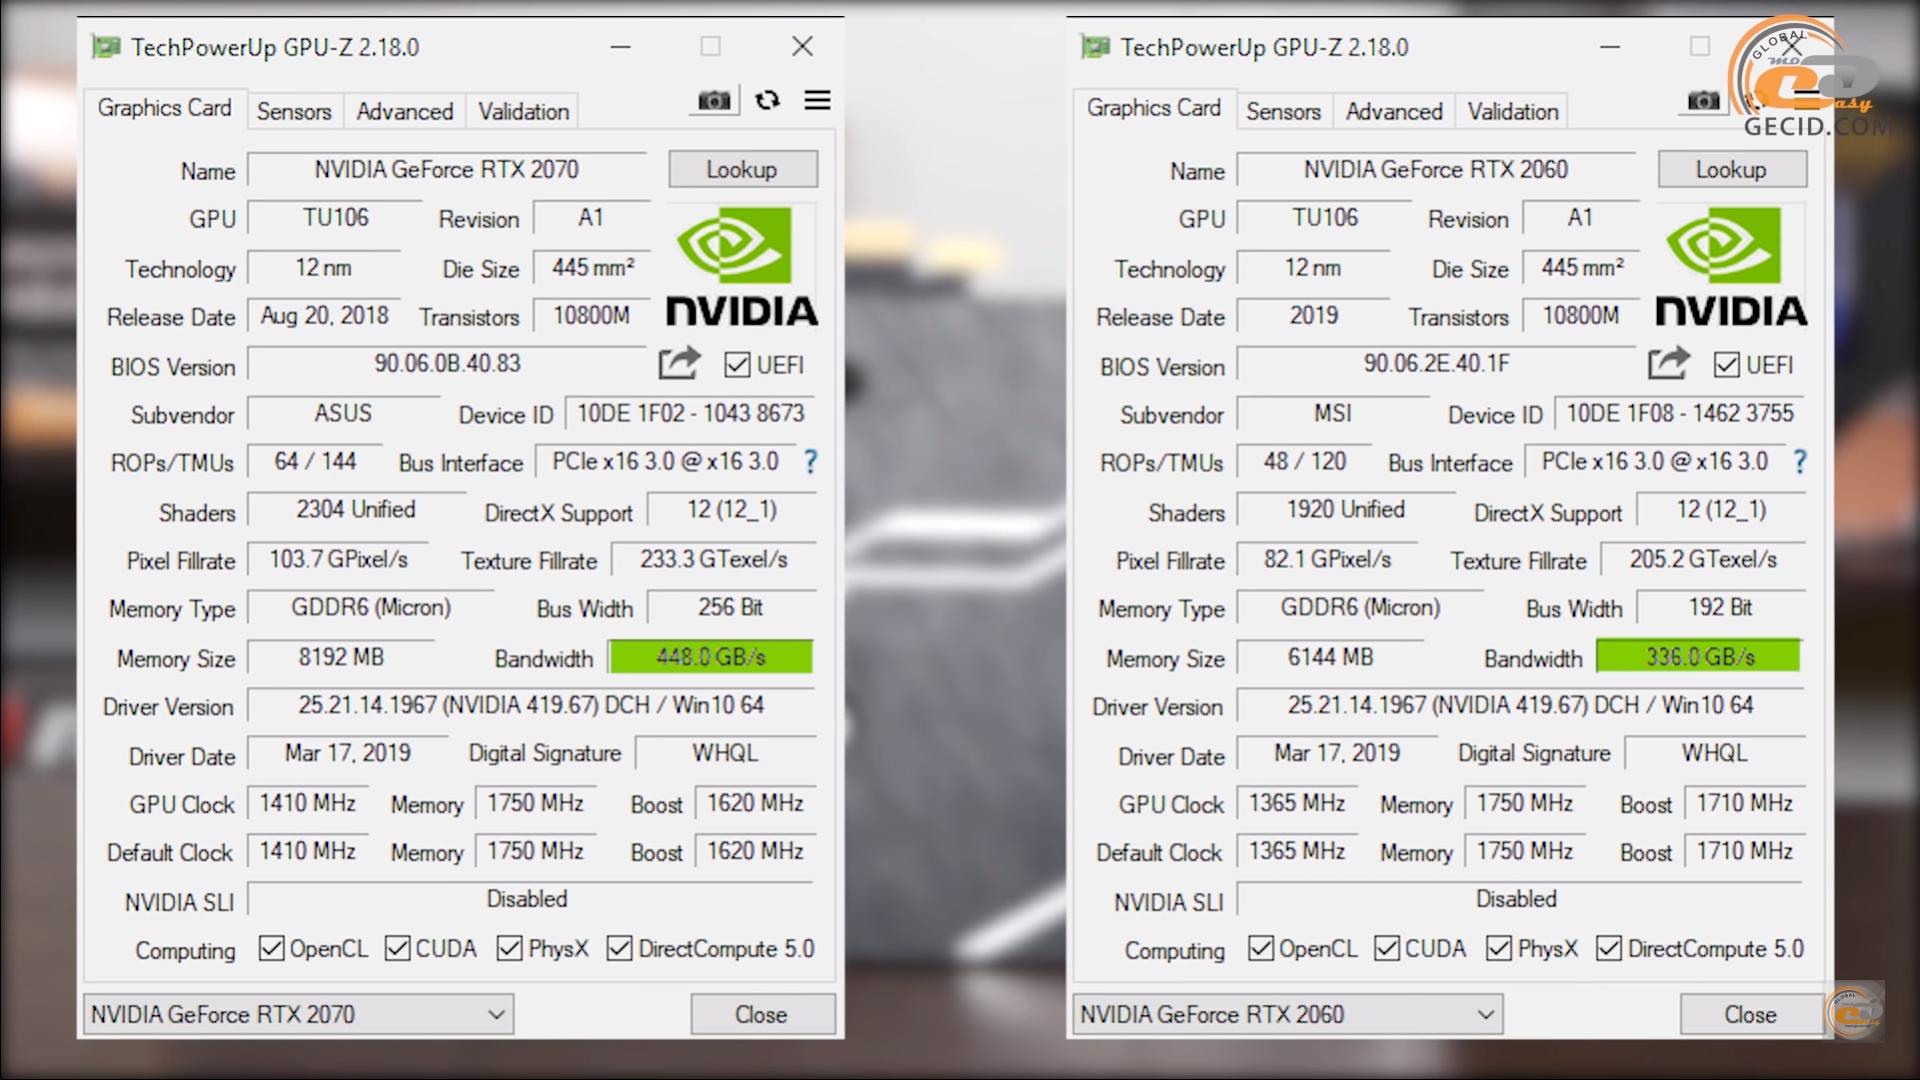 Сравнение GeForce RTX 2060 с RTX 2070, GTX 1070 Ti и RX Vega 56